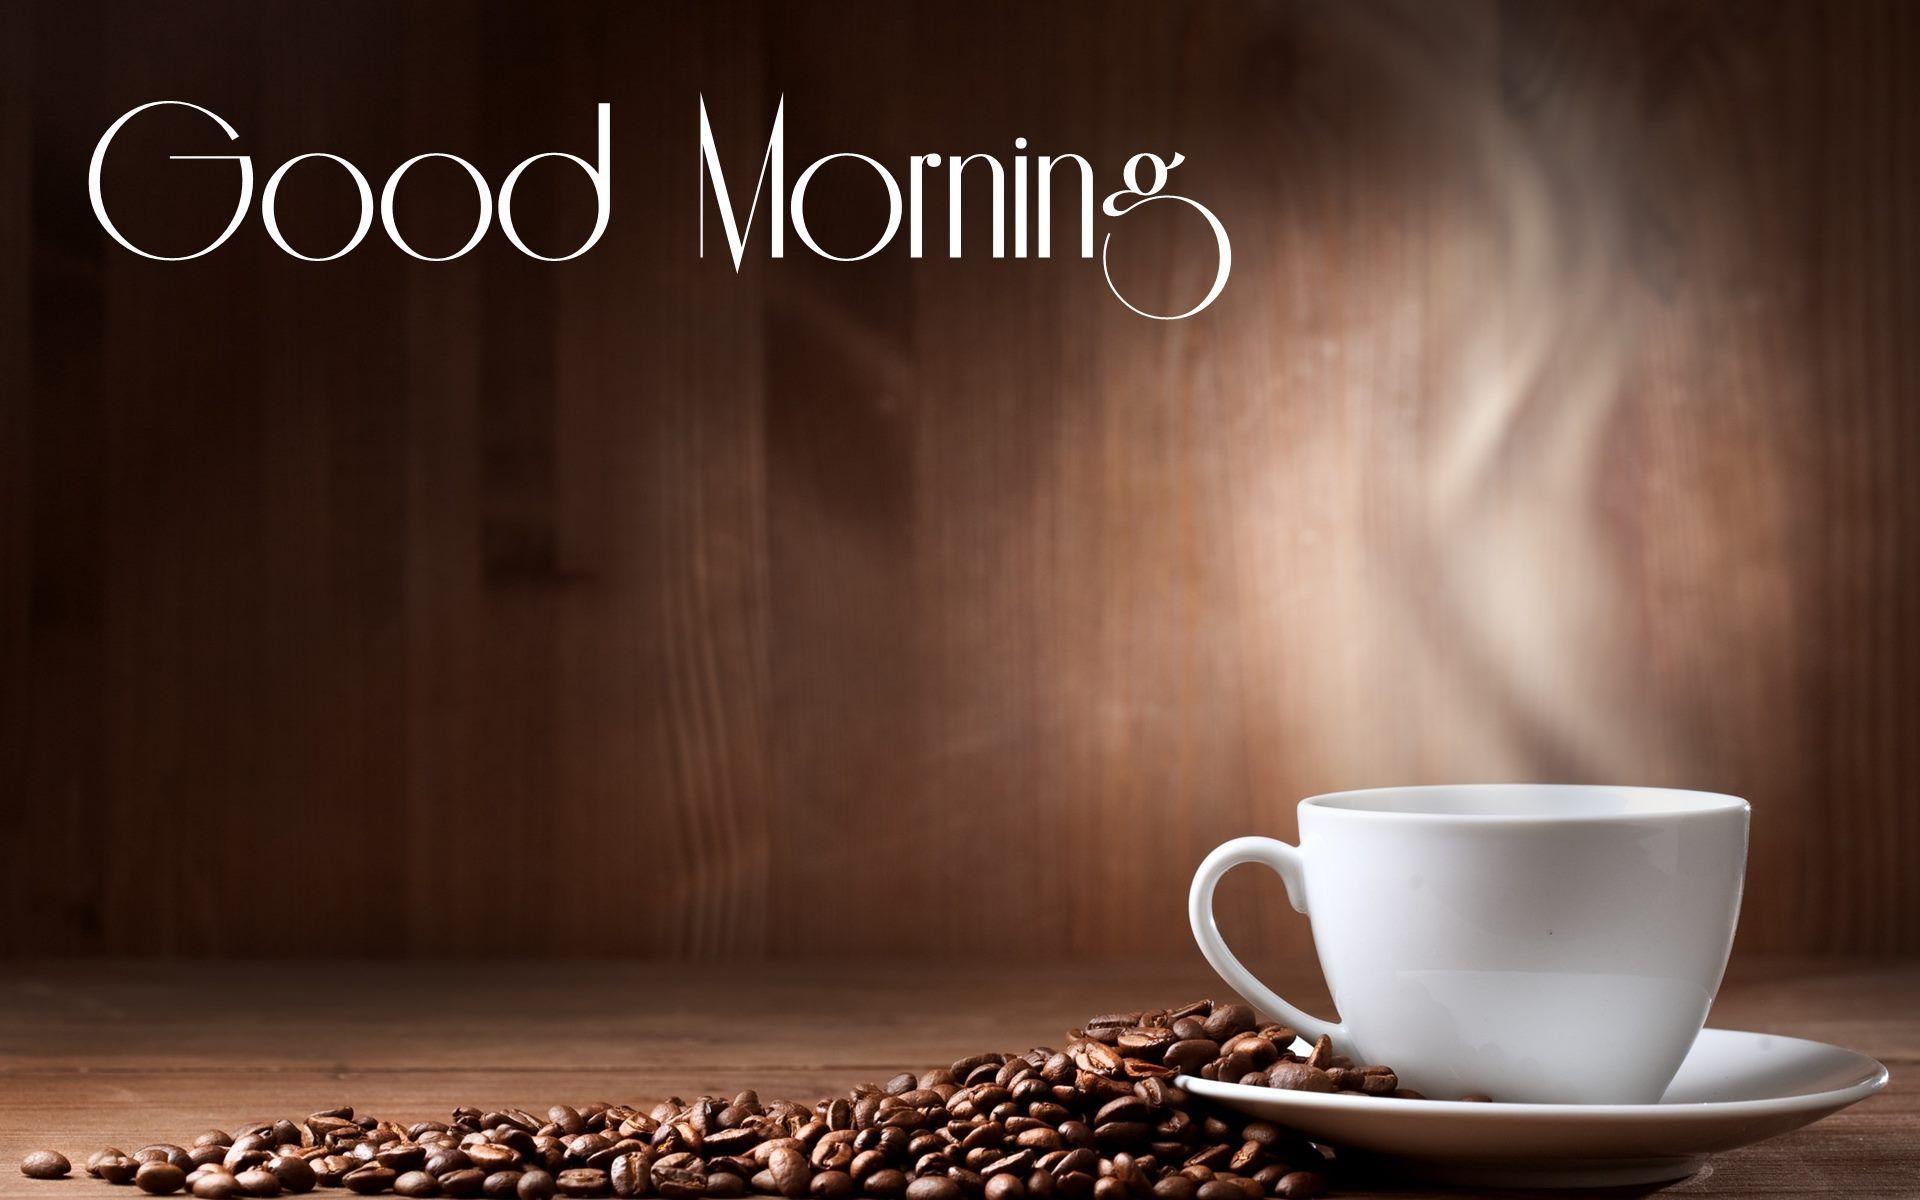 Good Morning Coffee Wallpaper Hd Download Of Hot Coffee Art